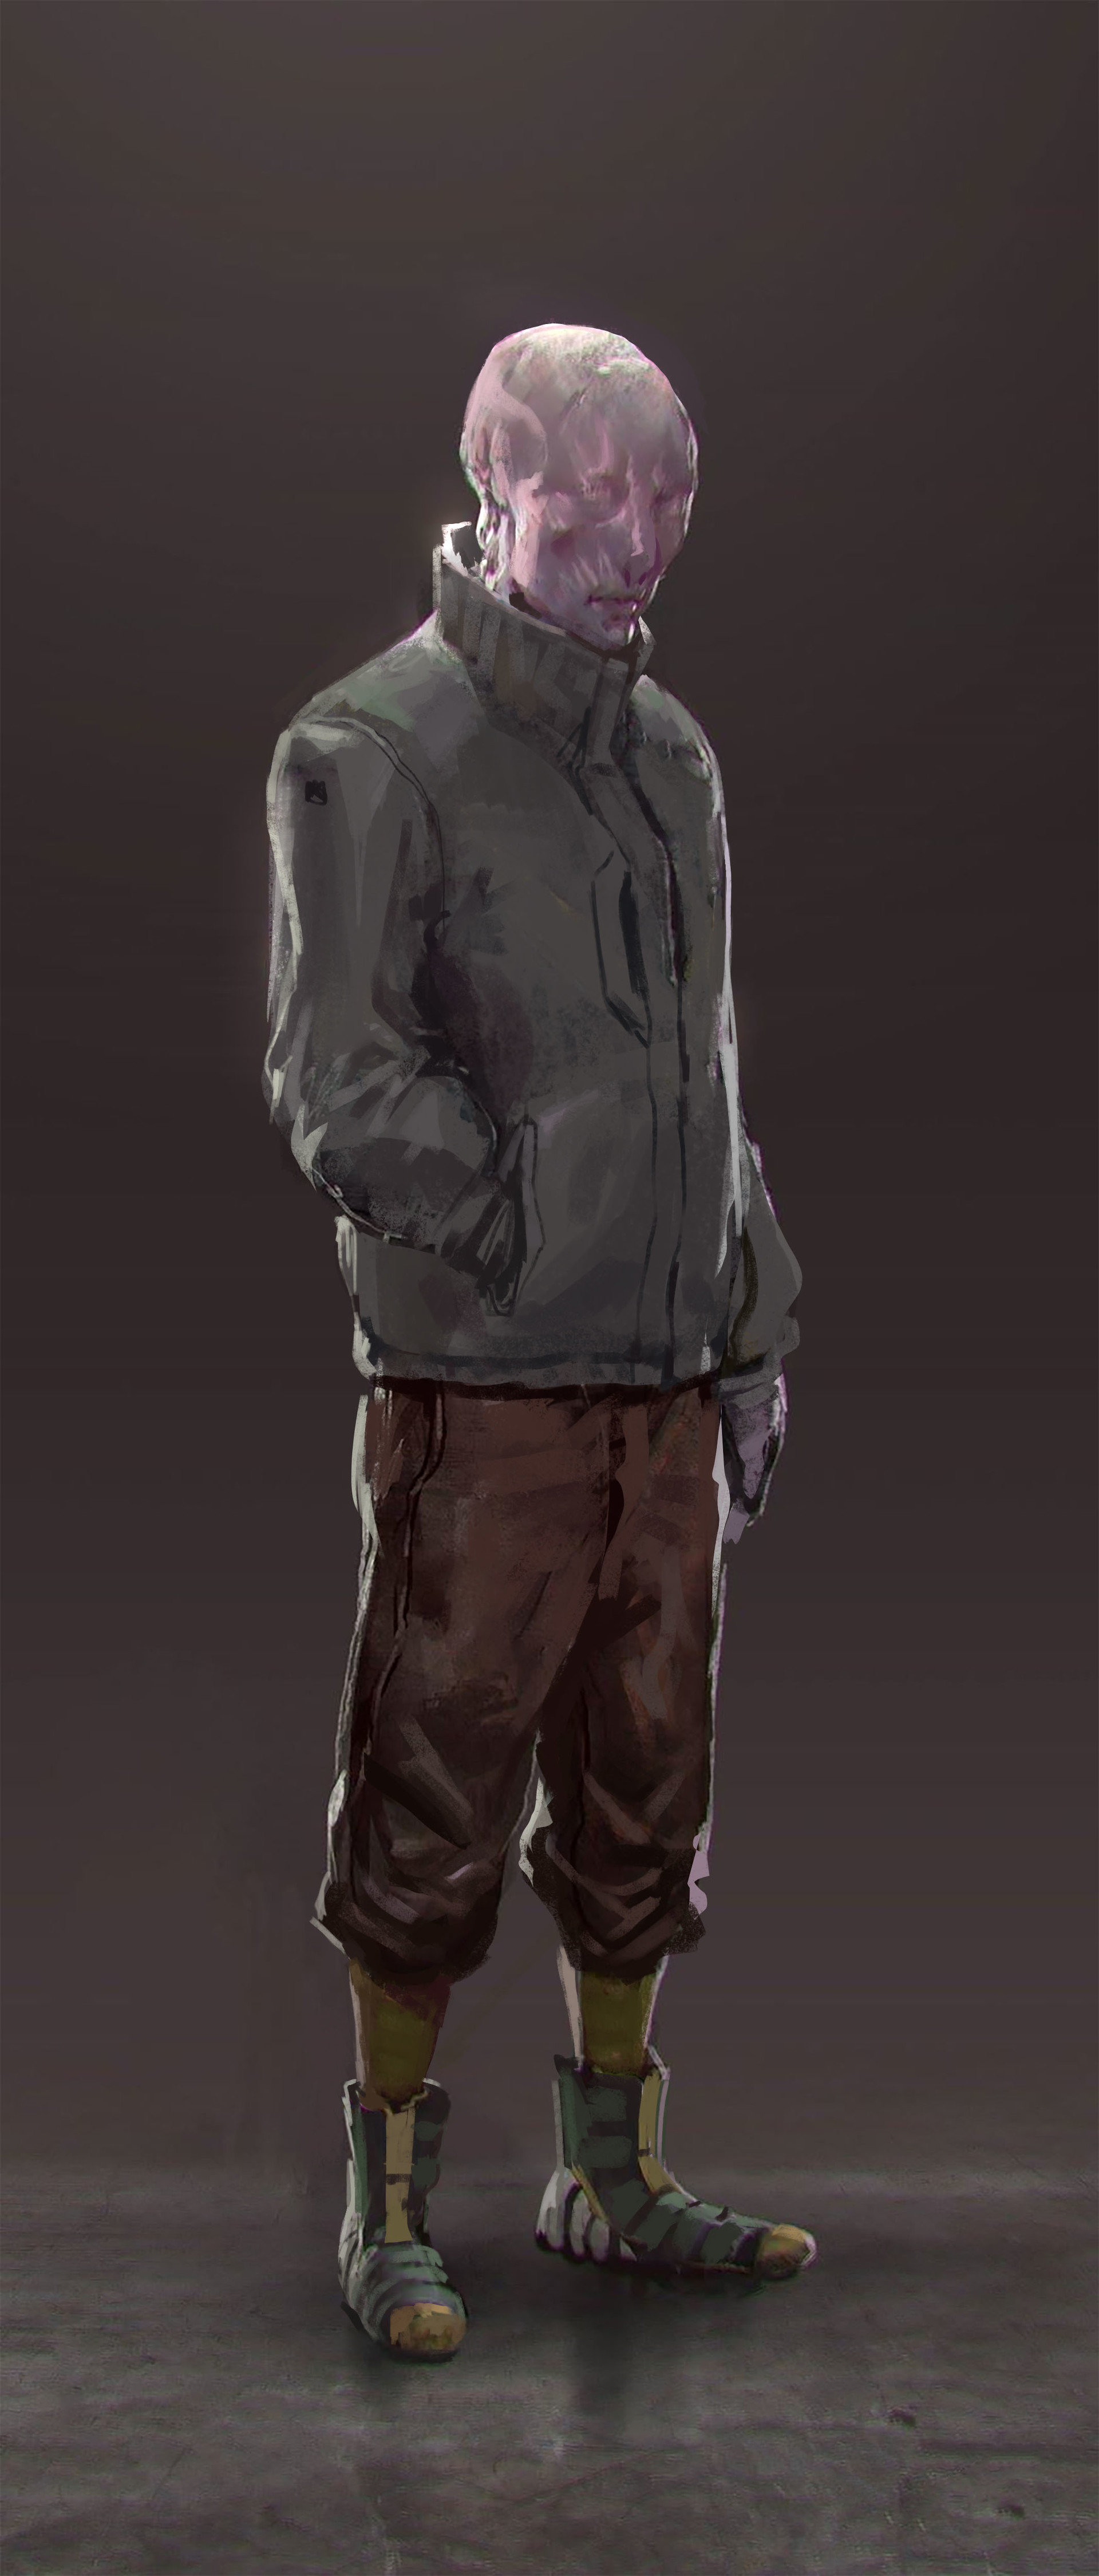 Adrian retana character 1